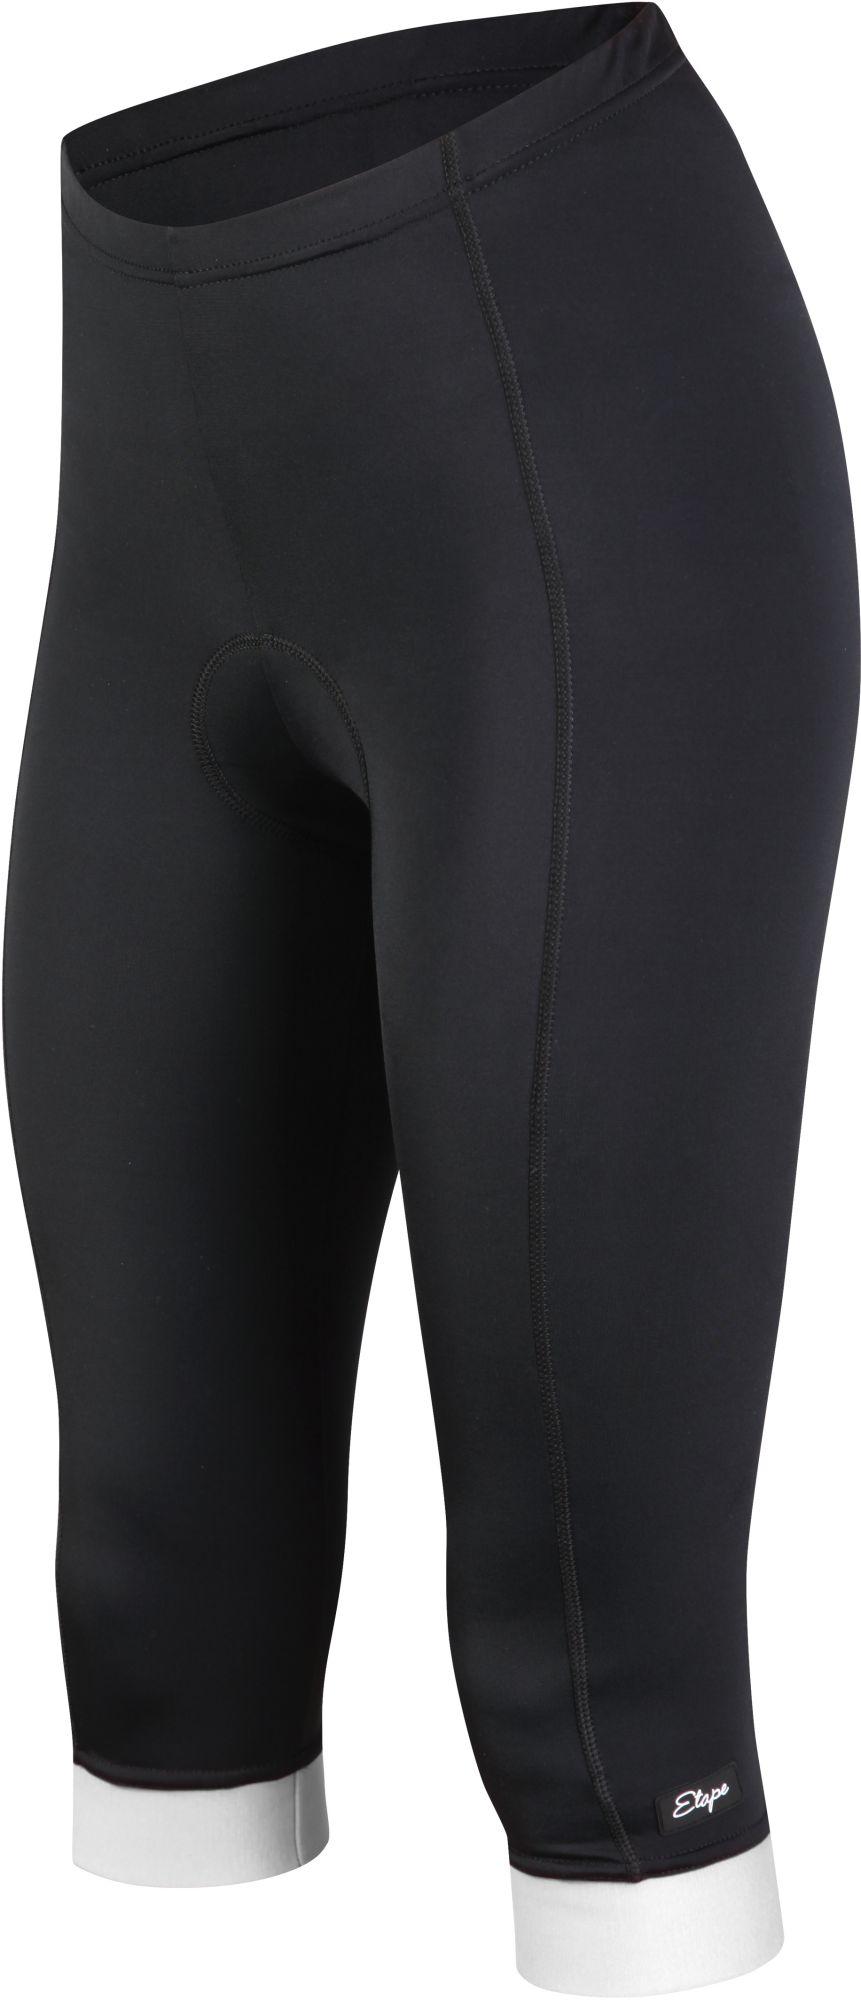 Etape SARA 3 4 KALHOTY W. Dámské cyklistické kalhoty 93e3e2efa1